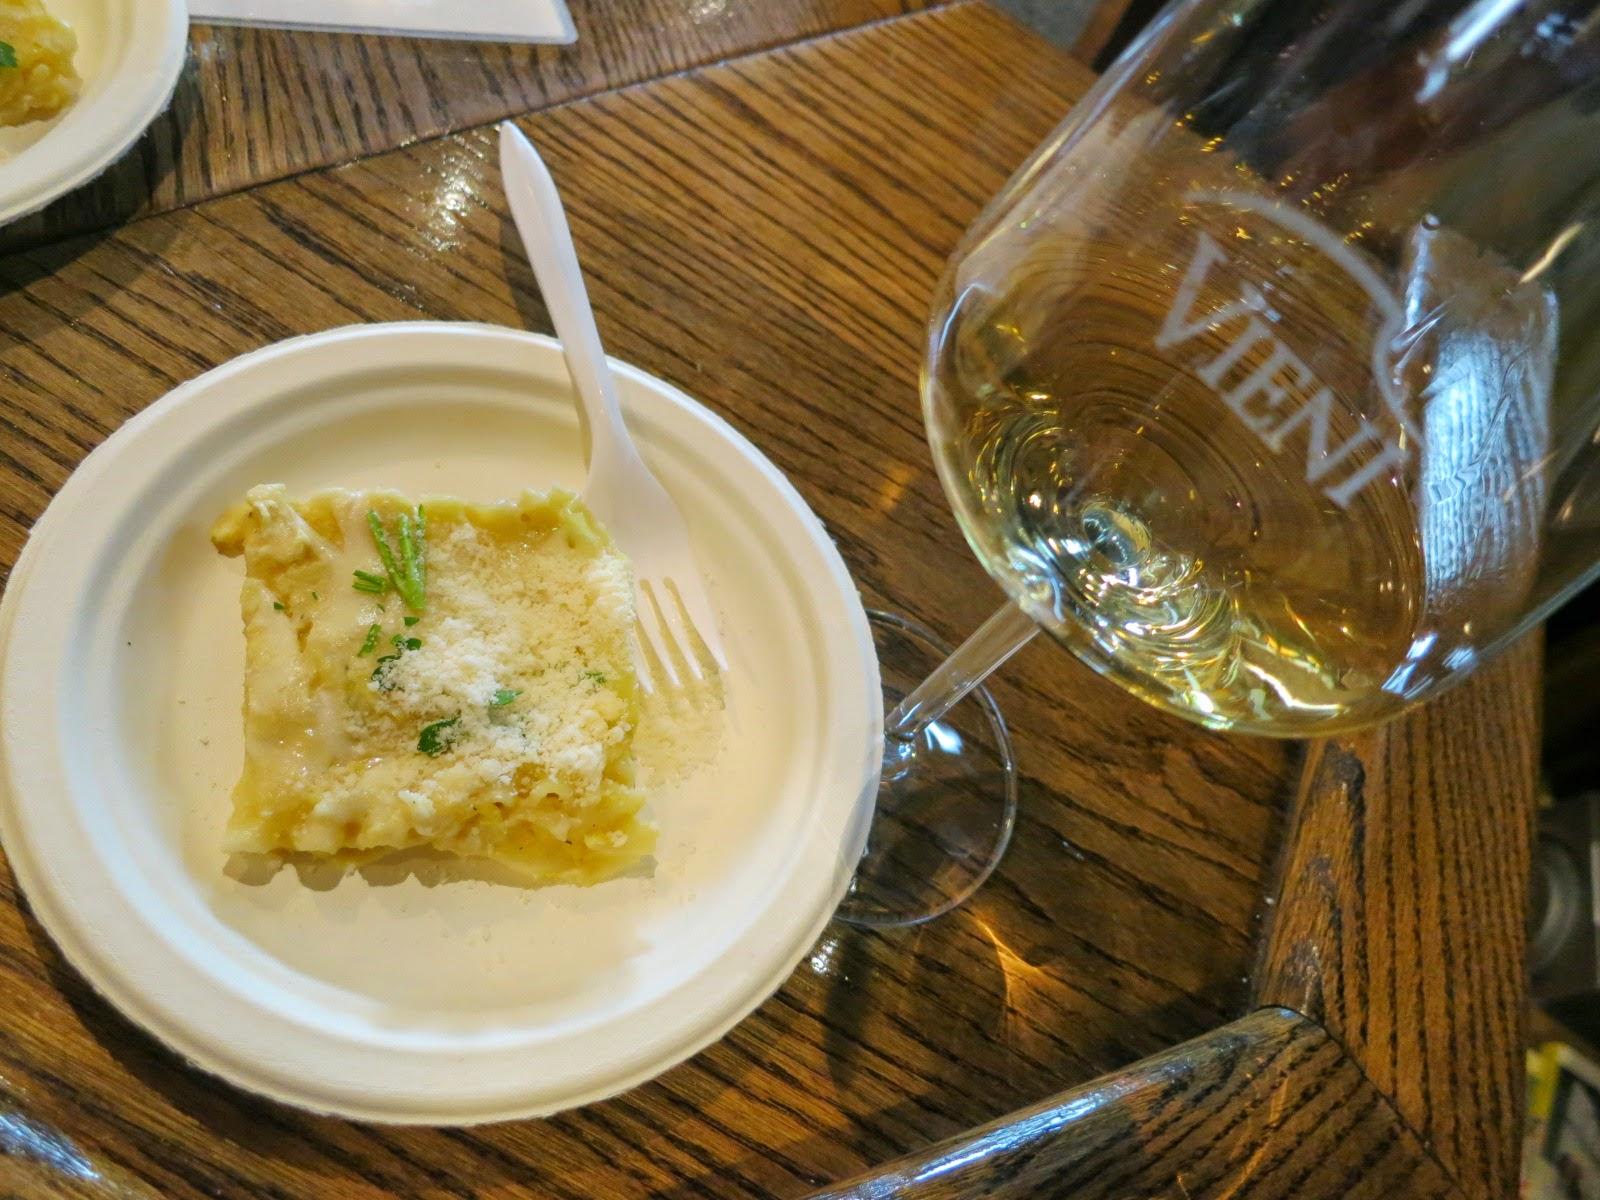 Butternut quash lasagna paired 2012 Vieni Chardonnay